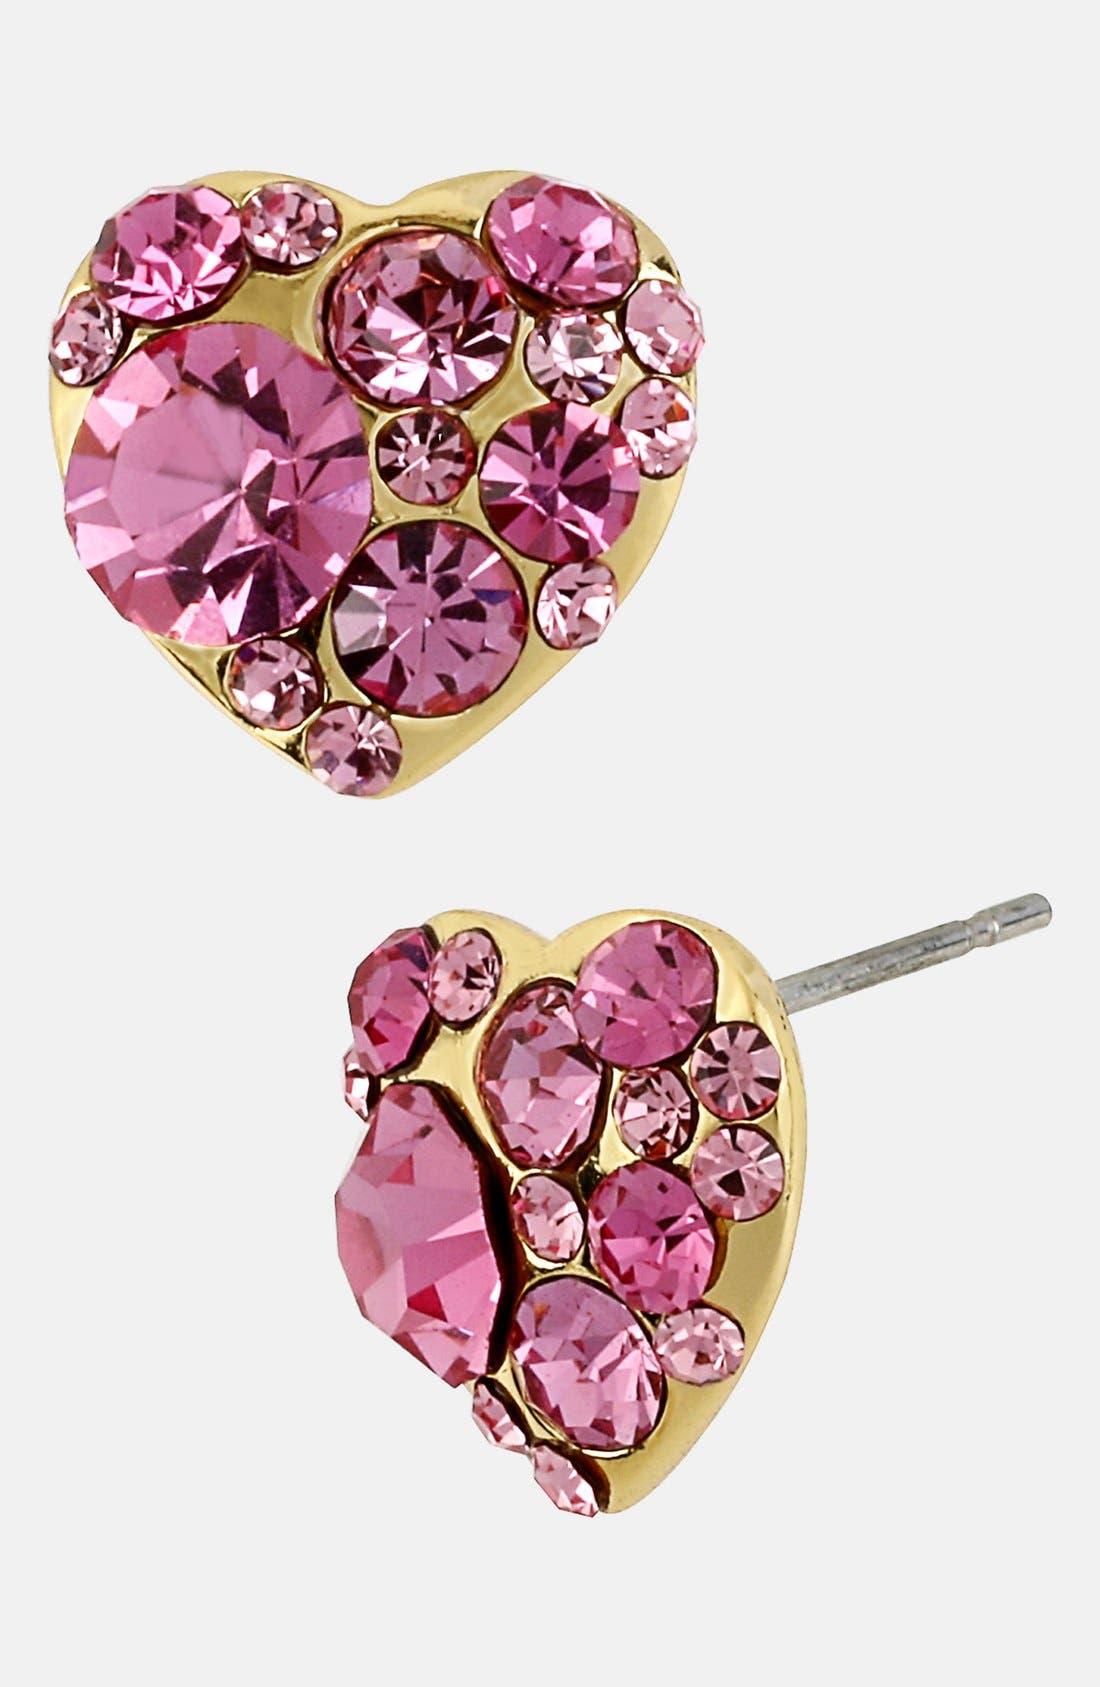 Main Image - Betsey Johnson 'Iconic Pinkalicious' Heart Stud Earrings